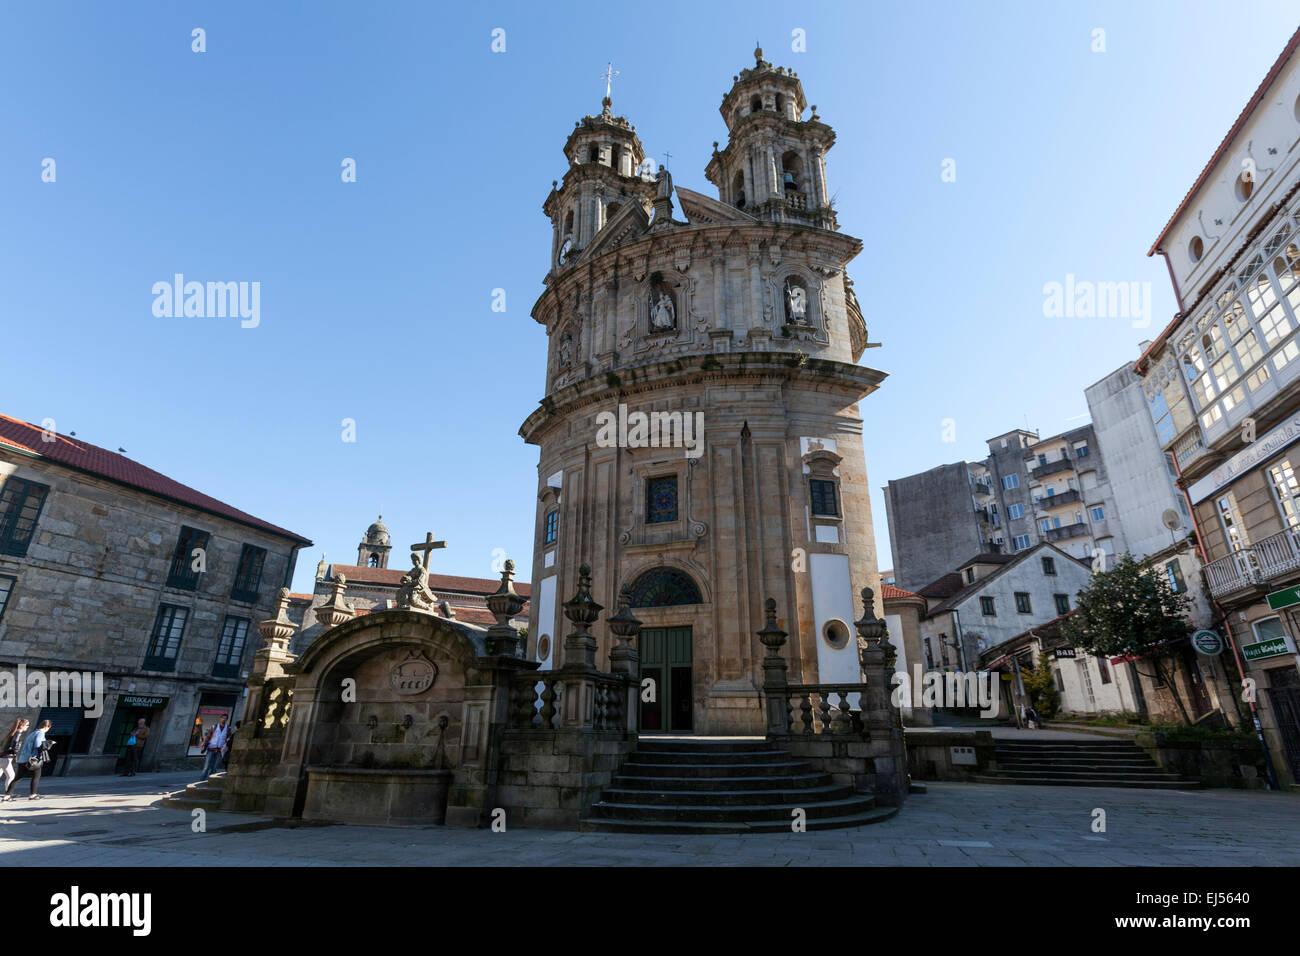 Rounded Baroque Pilgrim Church in Pontevedra - Stock Image